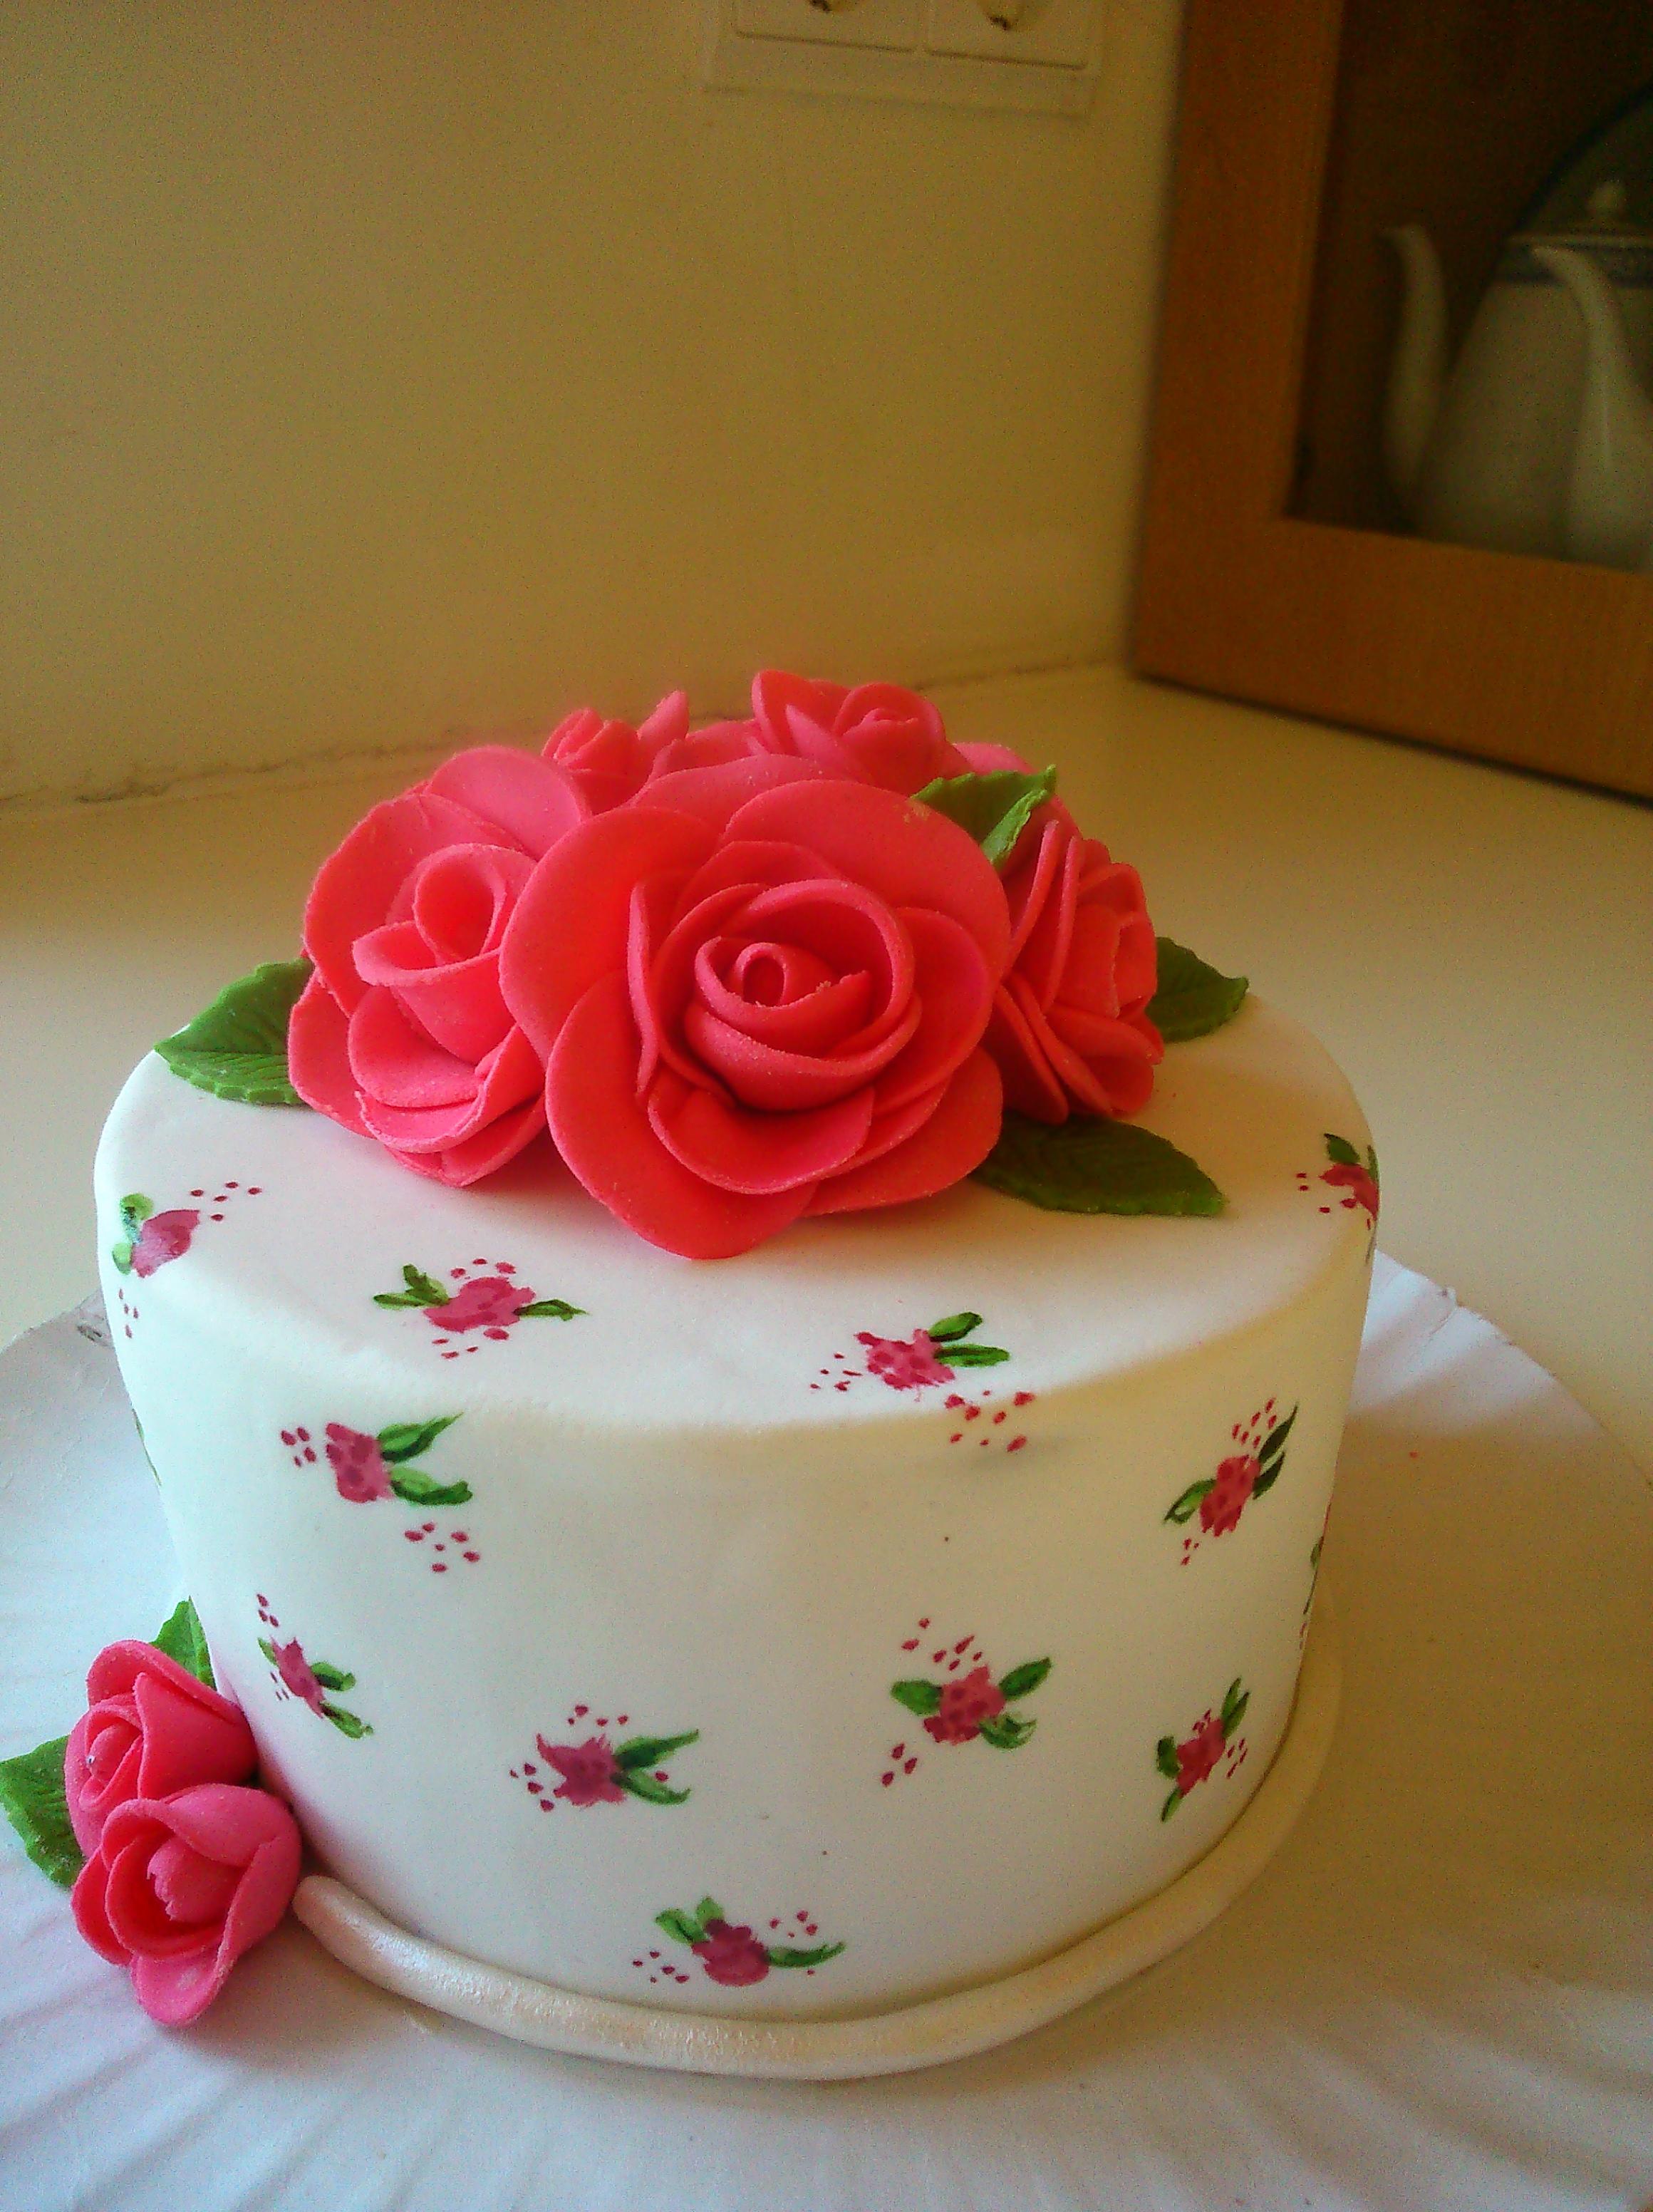 Dsc Mini Frosting Roses